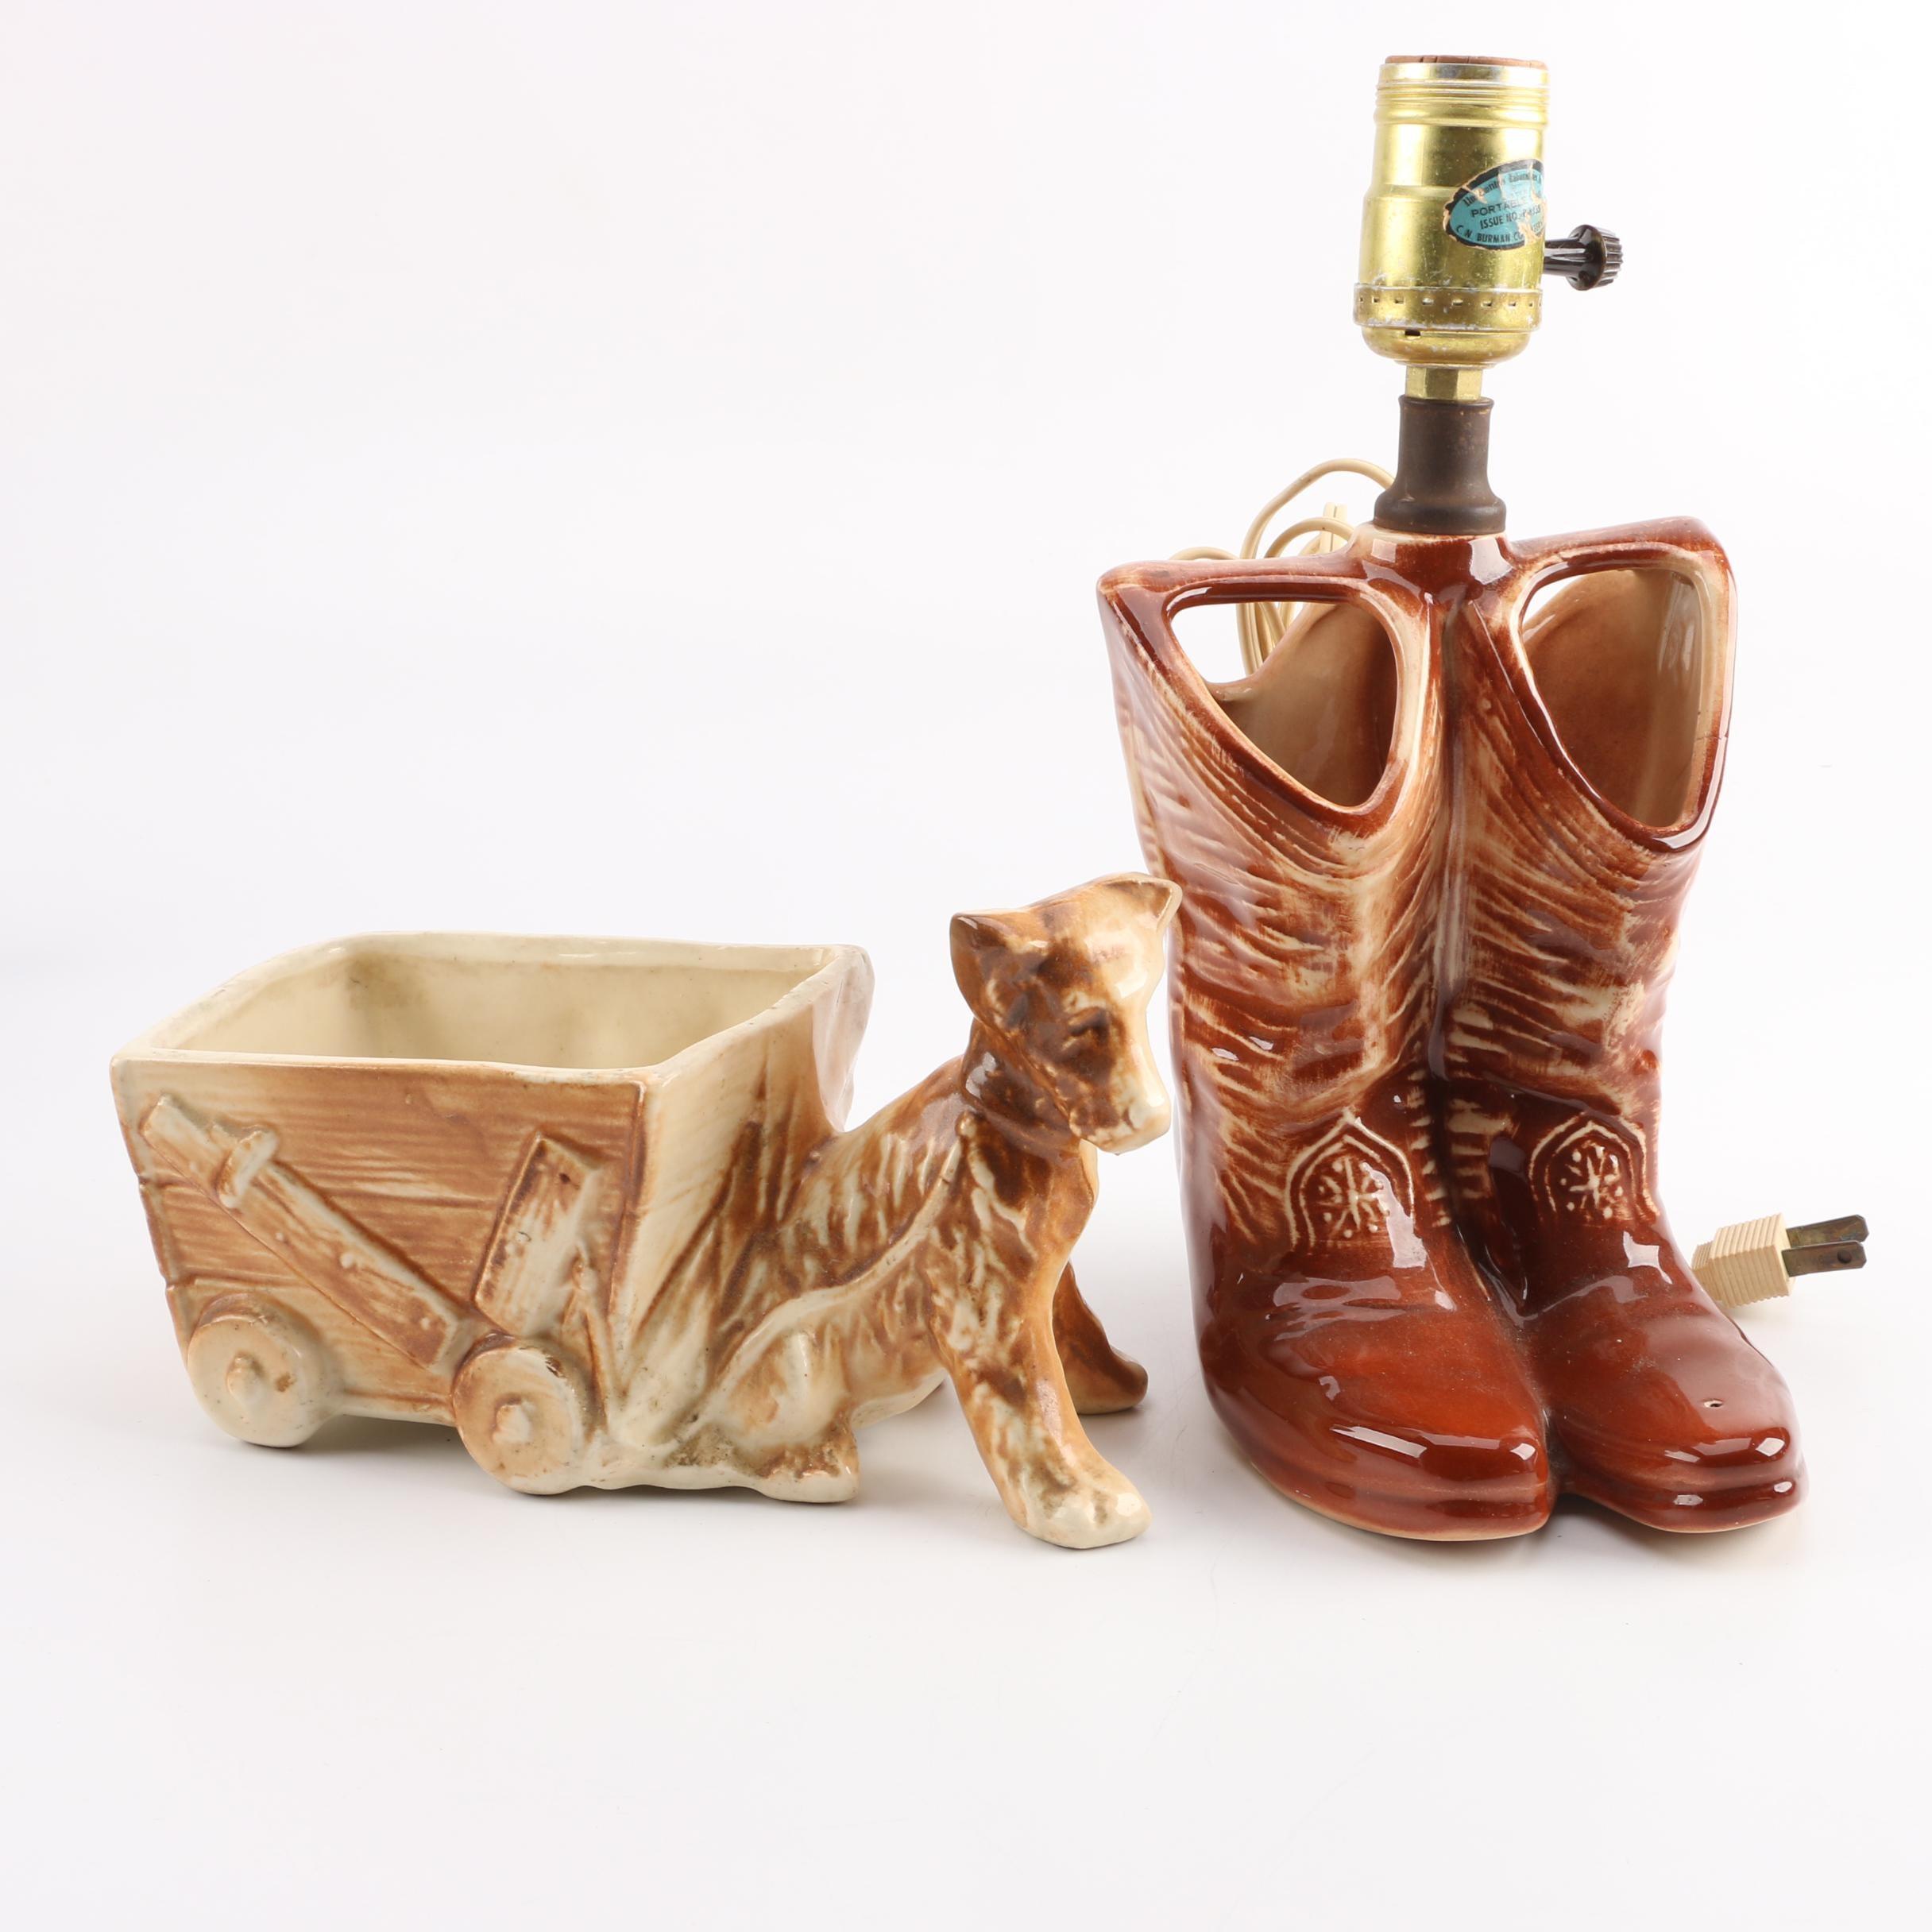 Vintage McCoy Ceramic Planter and Lamp